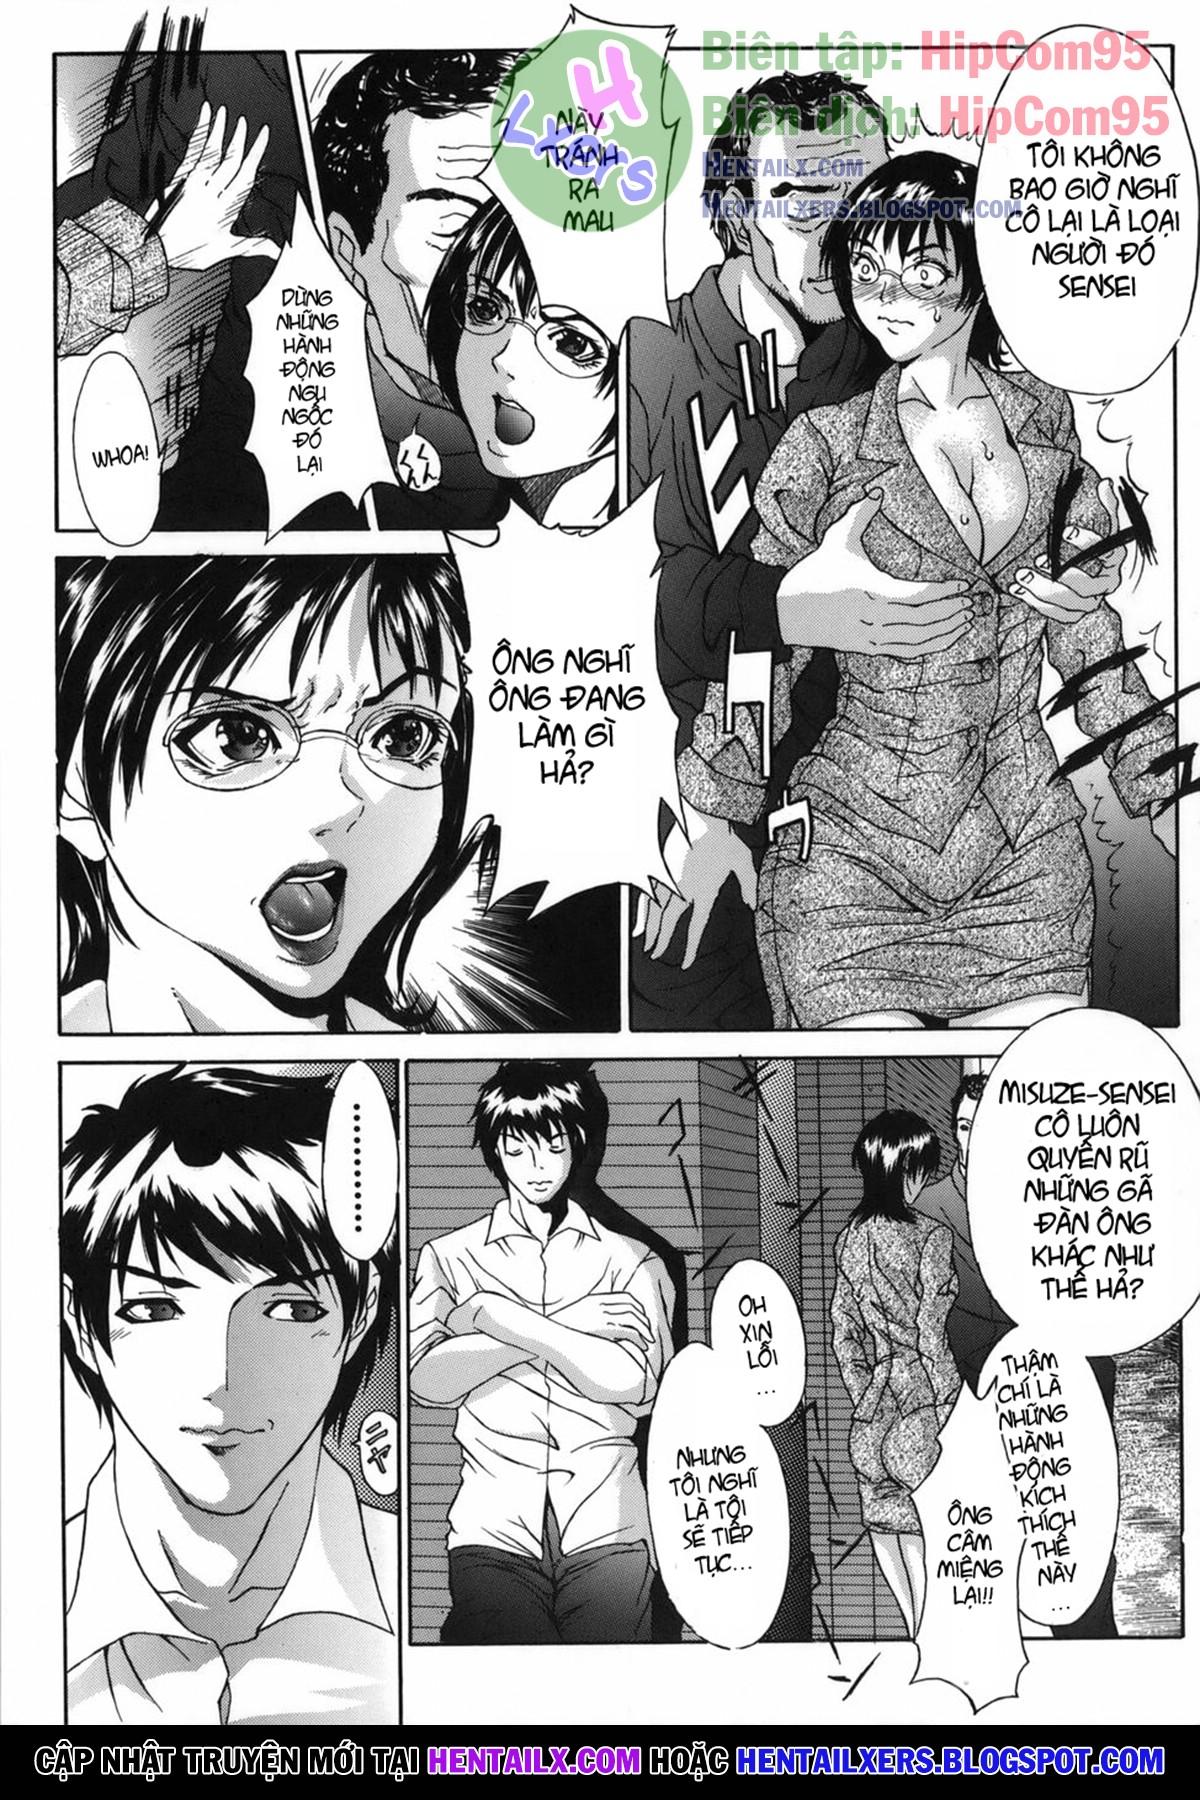 Hình ảnh 017_boinzuma_017 in Boinzuma - Motherlike Obscene Wife